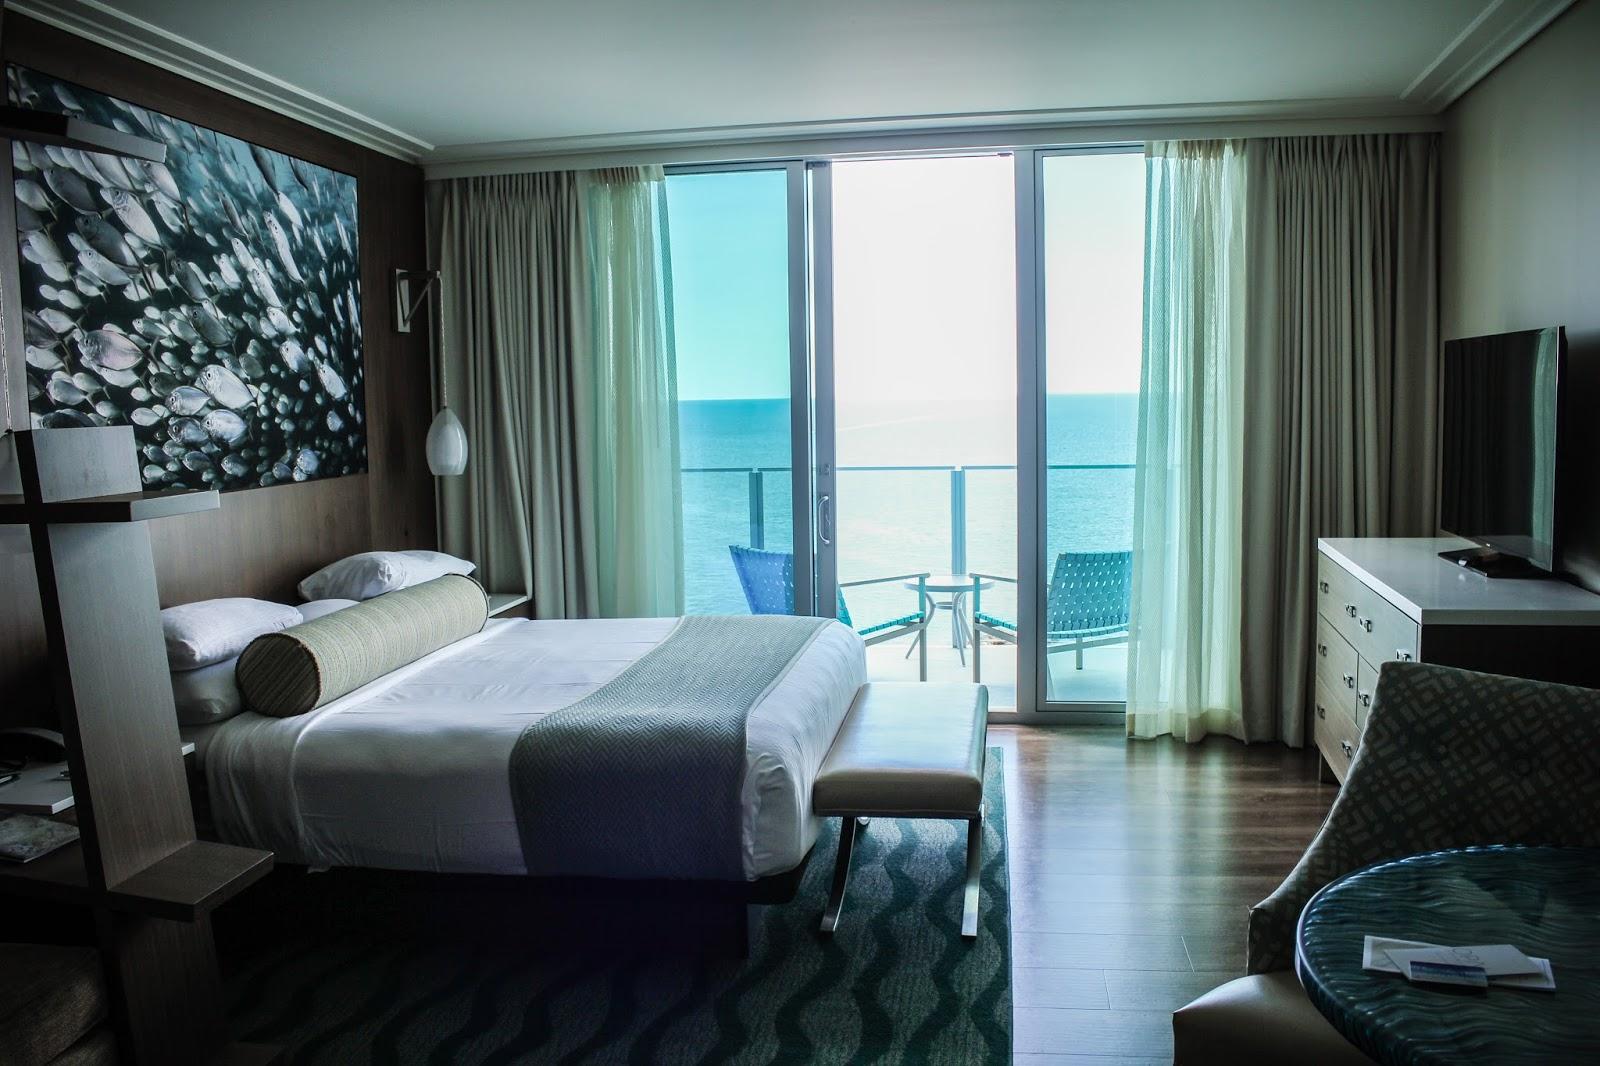 Opal Sands Resort, Clearwater Beach Florida, Neutral2Neon